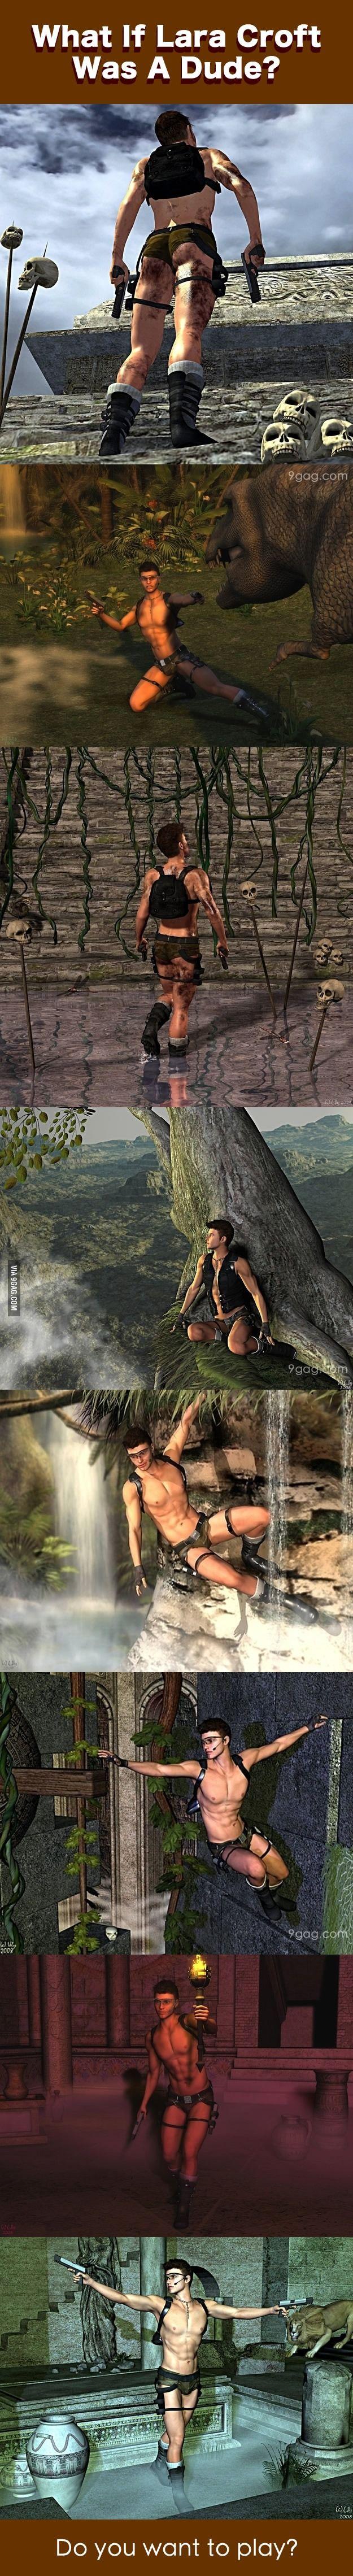 Oh Mr. Lara Croft, how many guns do you have?